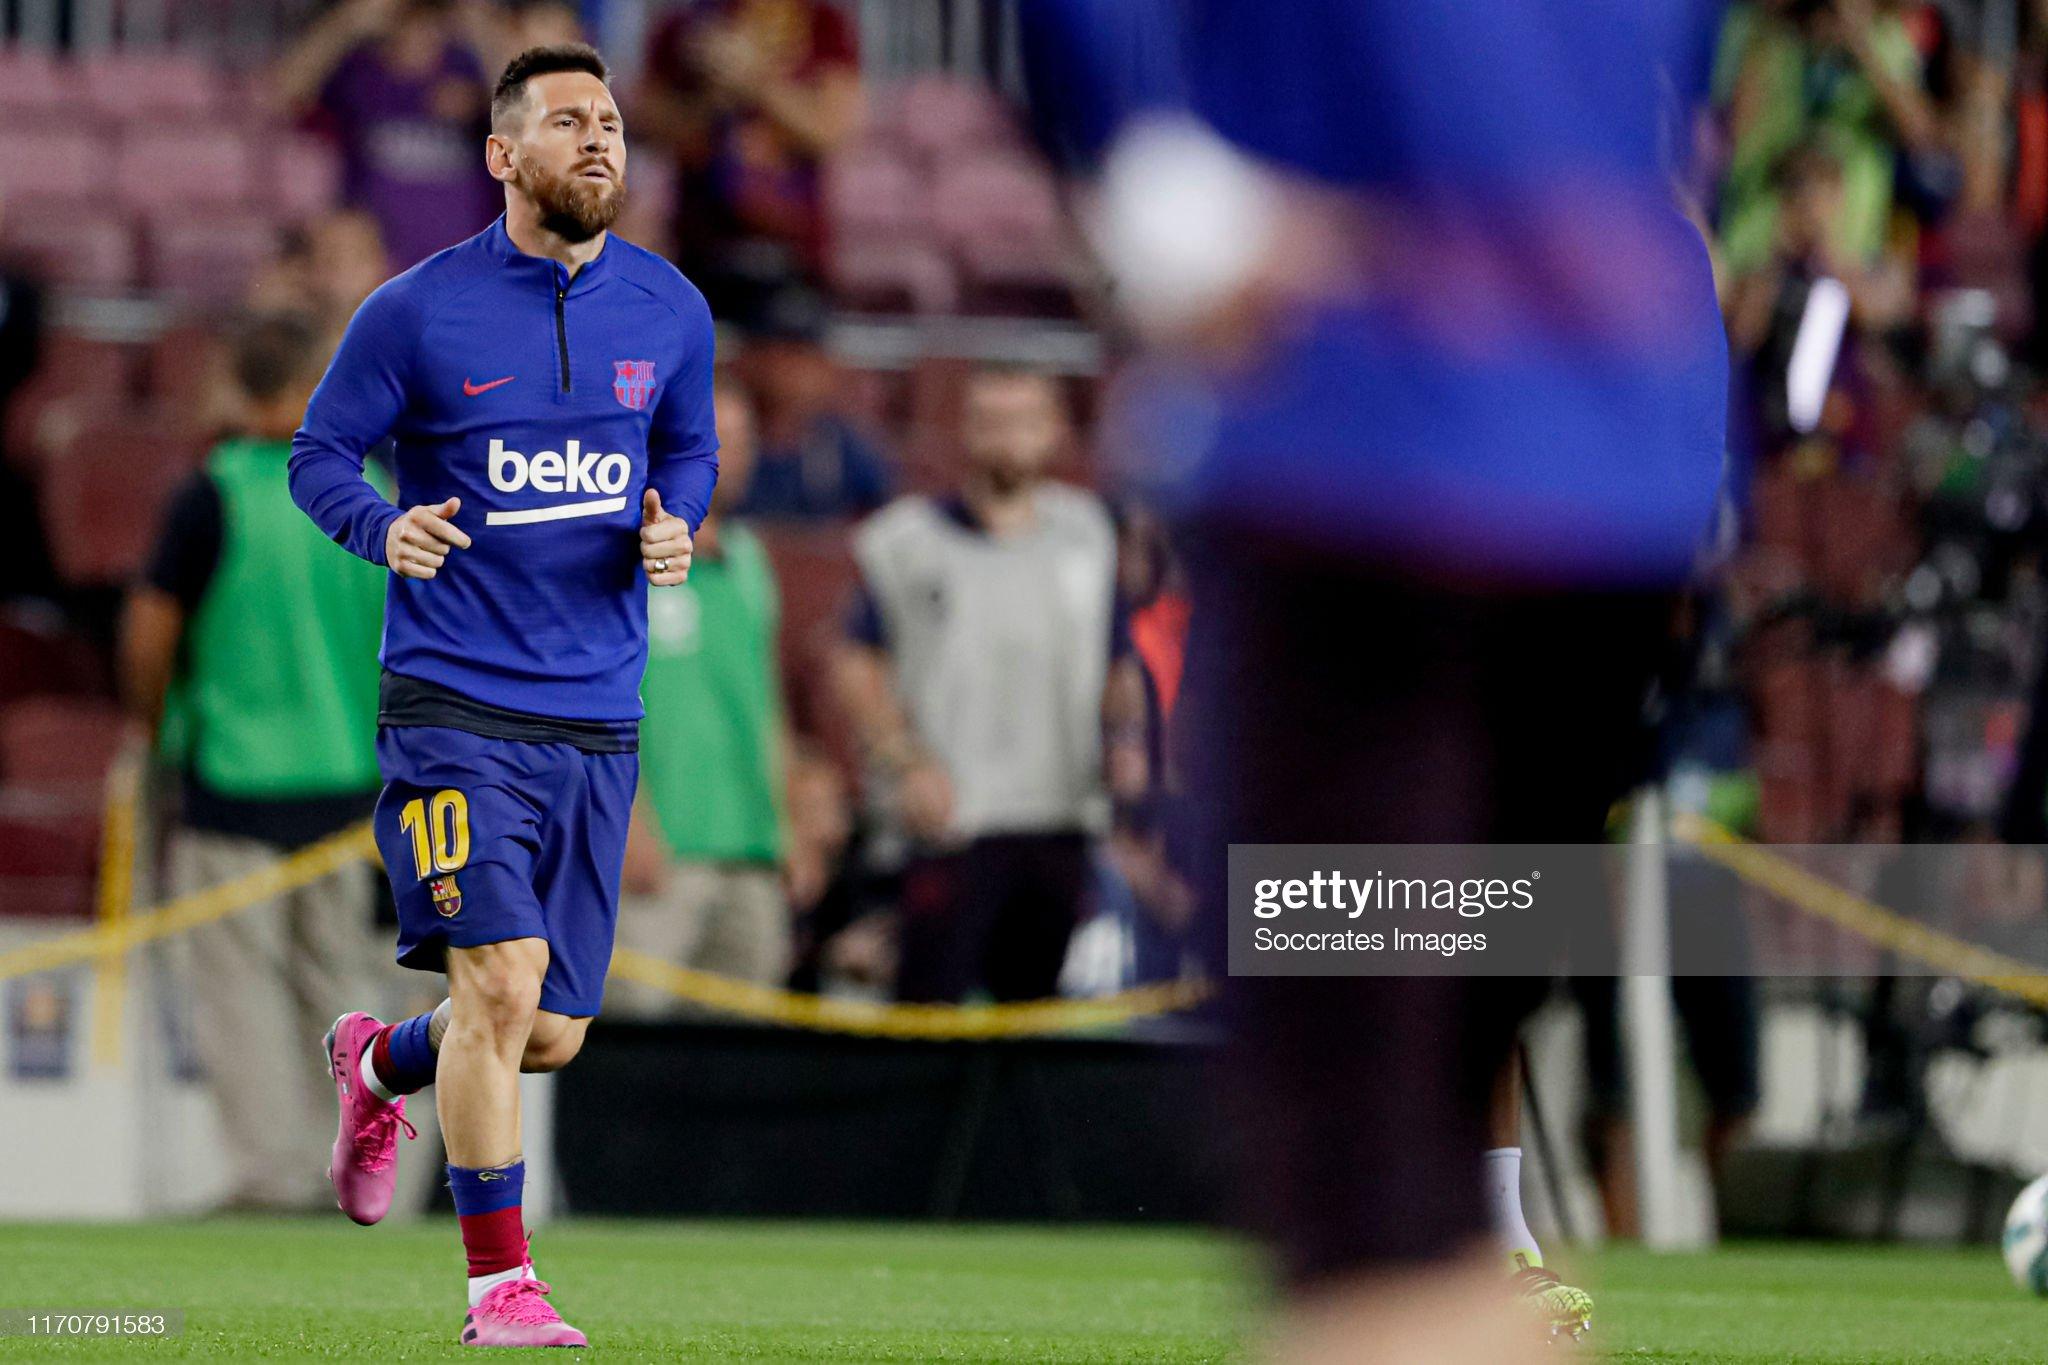 صور مباراة : برشلونة - فياريال 2-1 ( 24-09-2019 )  Lionel-messi-of-fc-barcelona-during-the-la-liga-santander-match-fc-picture-id1170791583?s=2048x2048